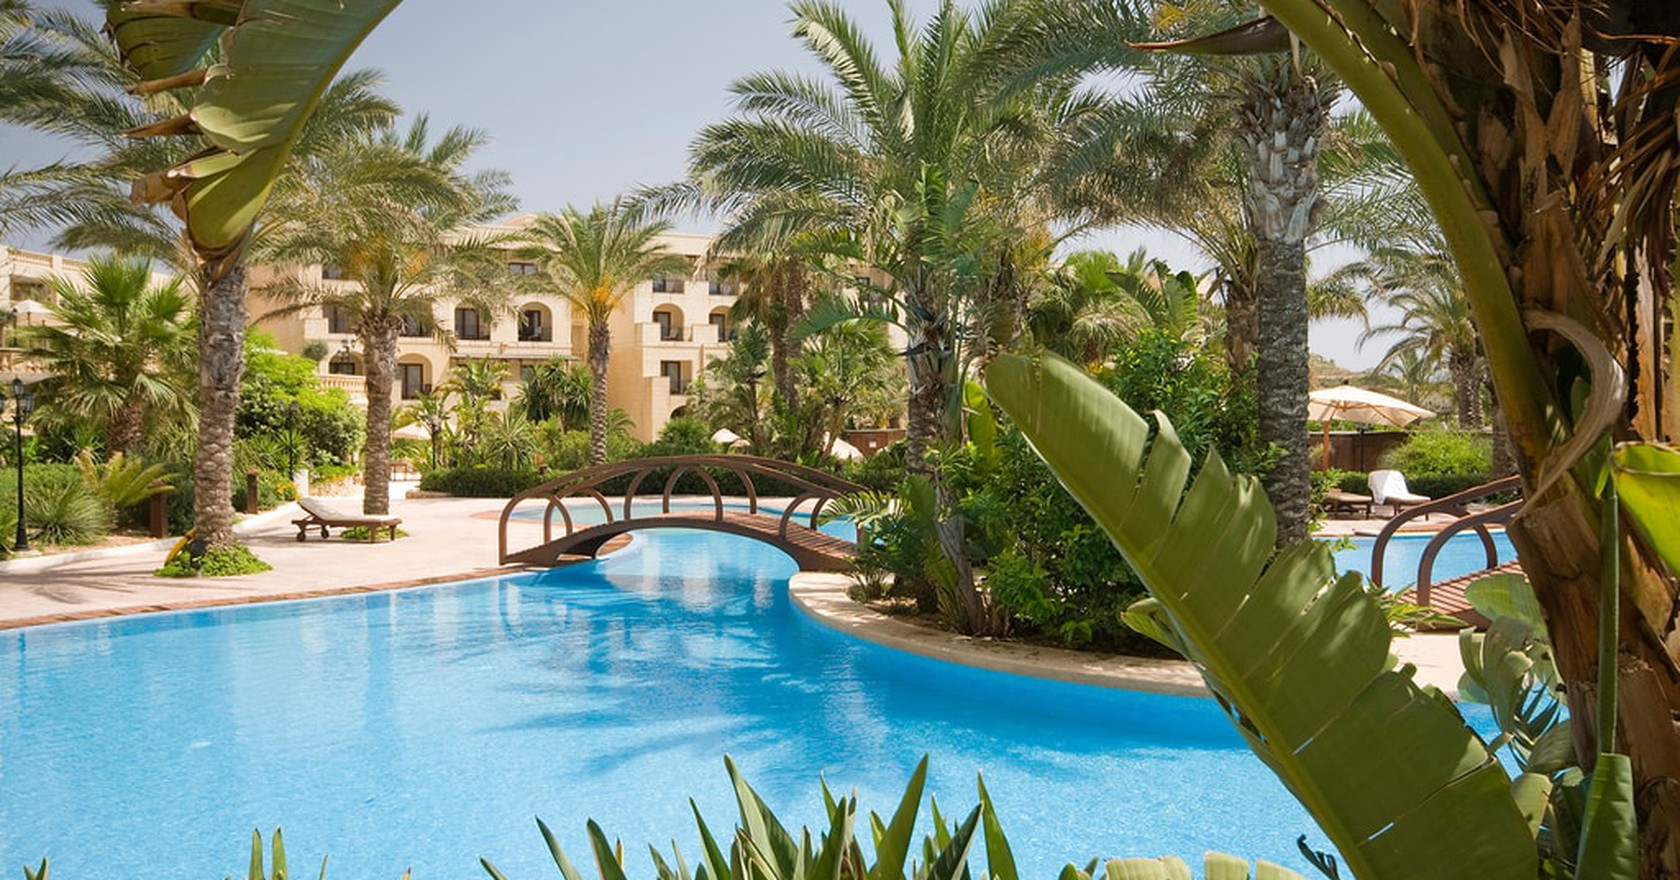 Residence Pool Kempinski Hotel Gozo